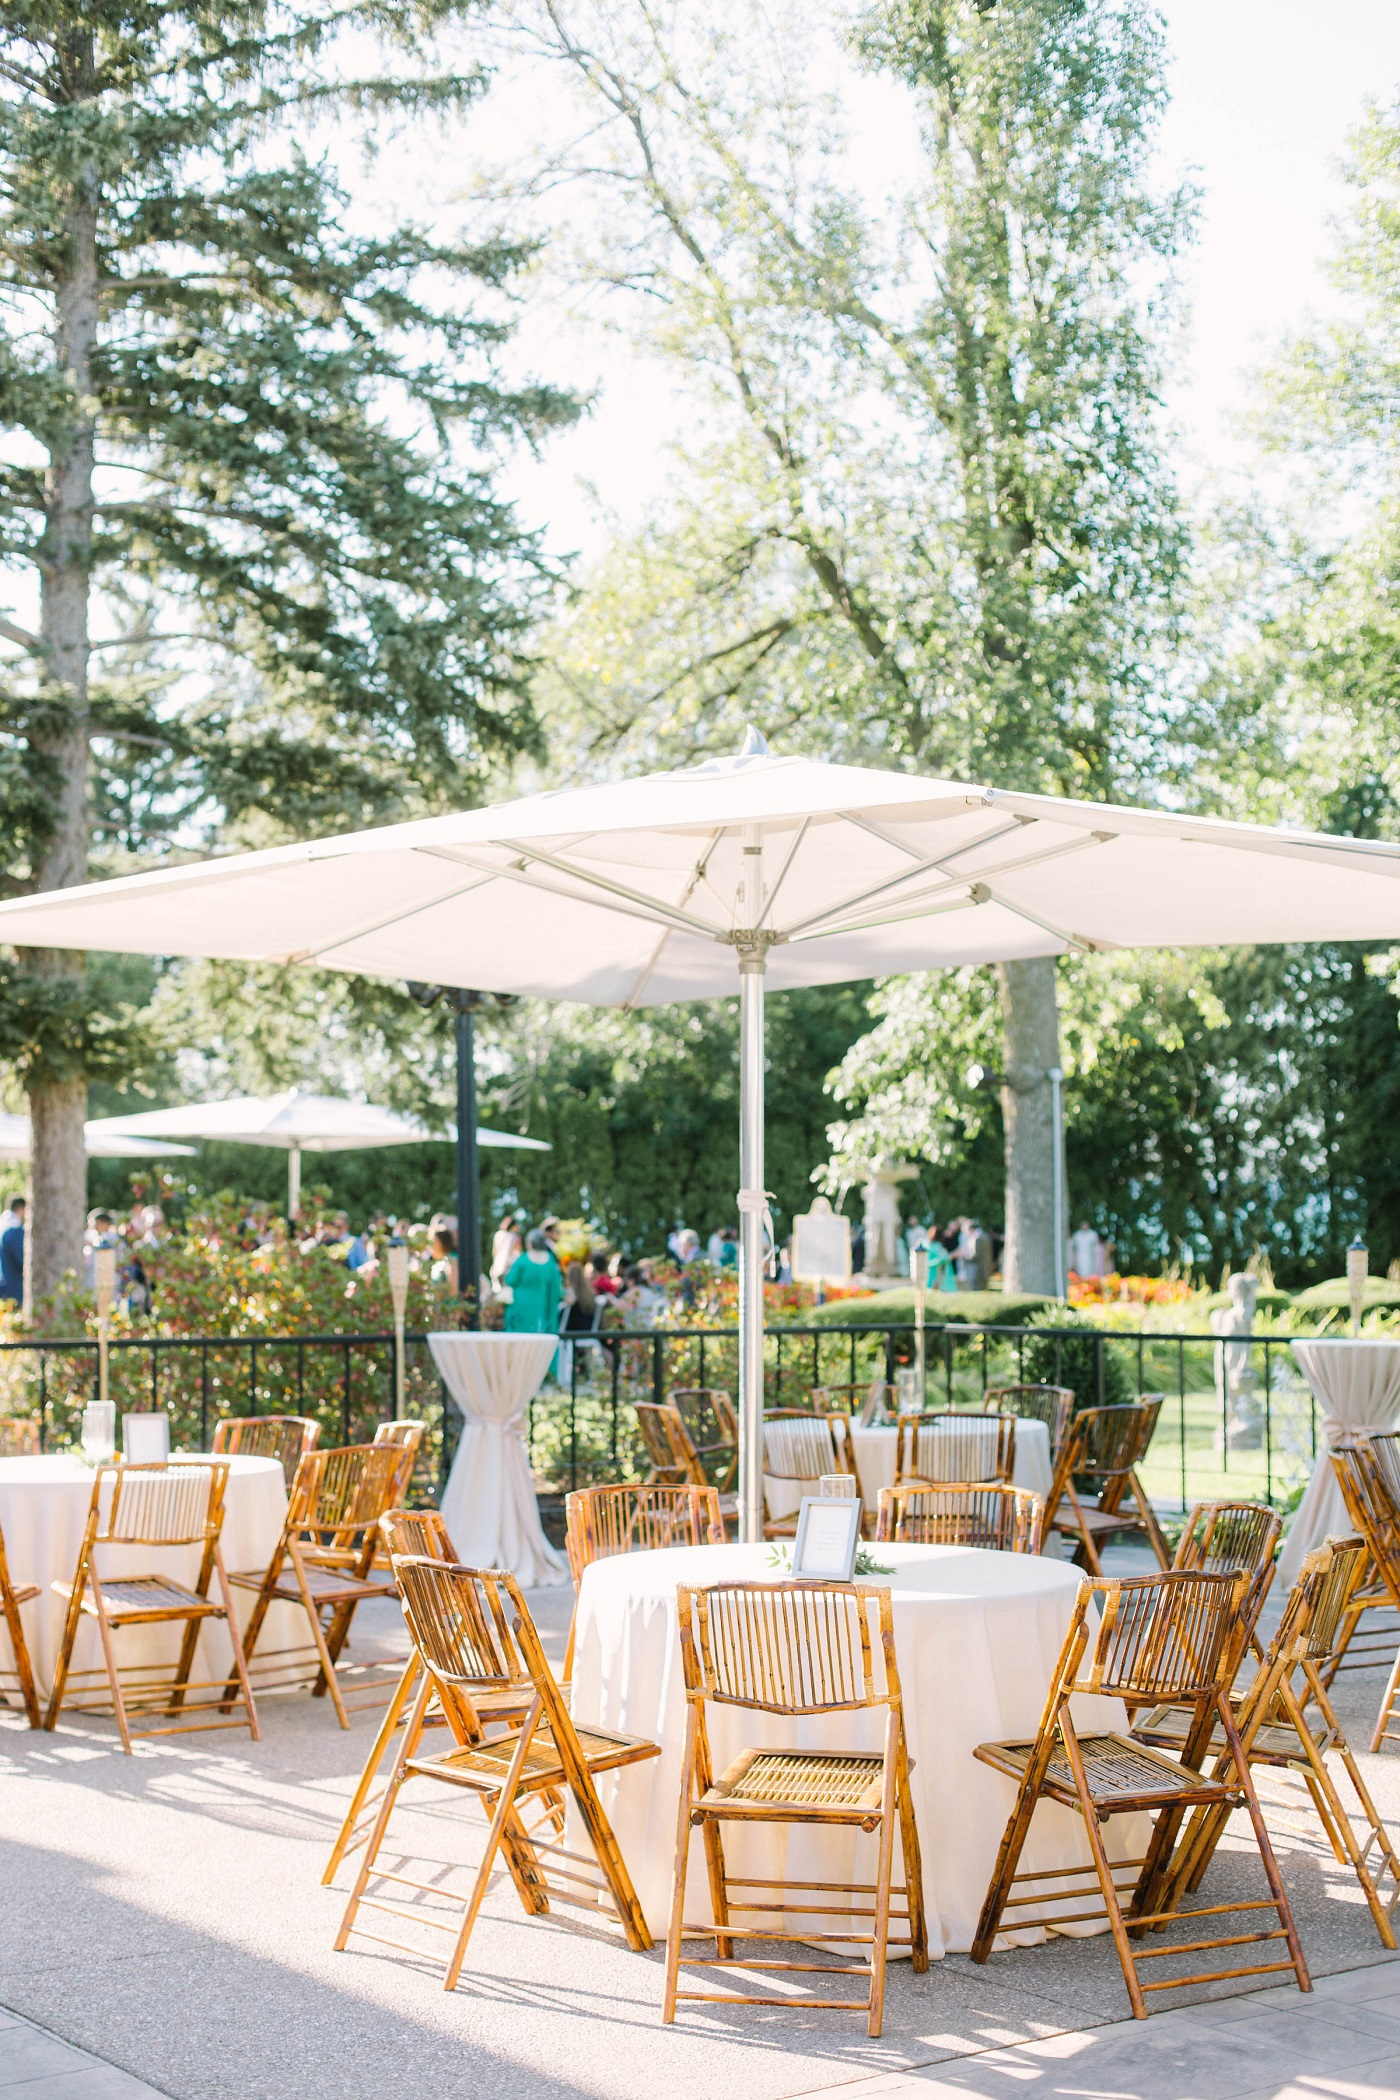 liuna-gardens-wedding-hamilton-kj-and-co-31.JPG